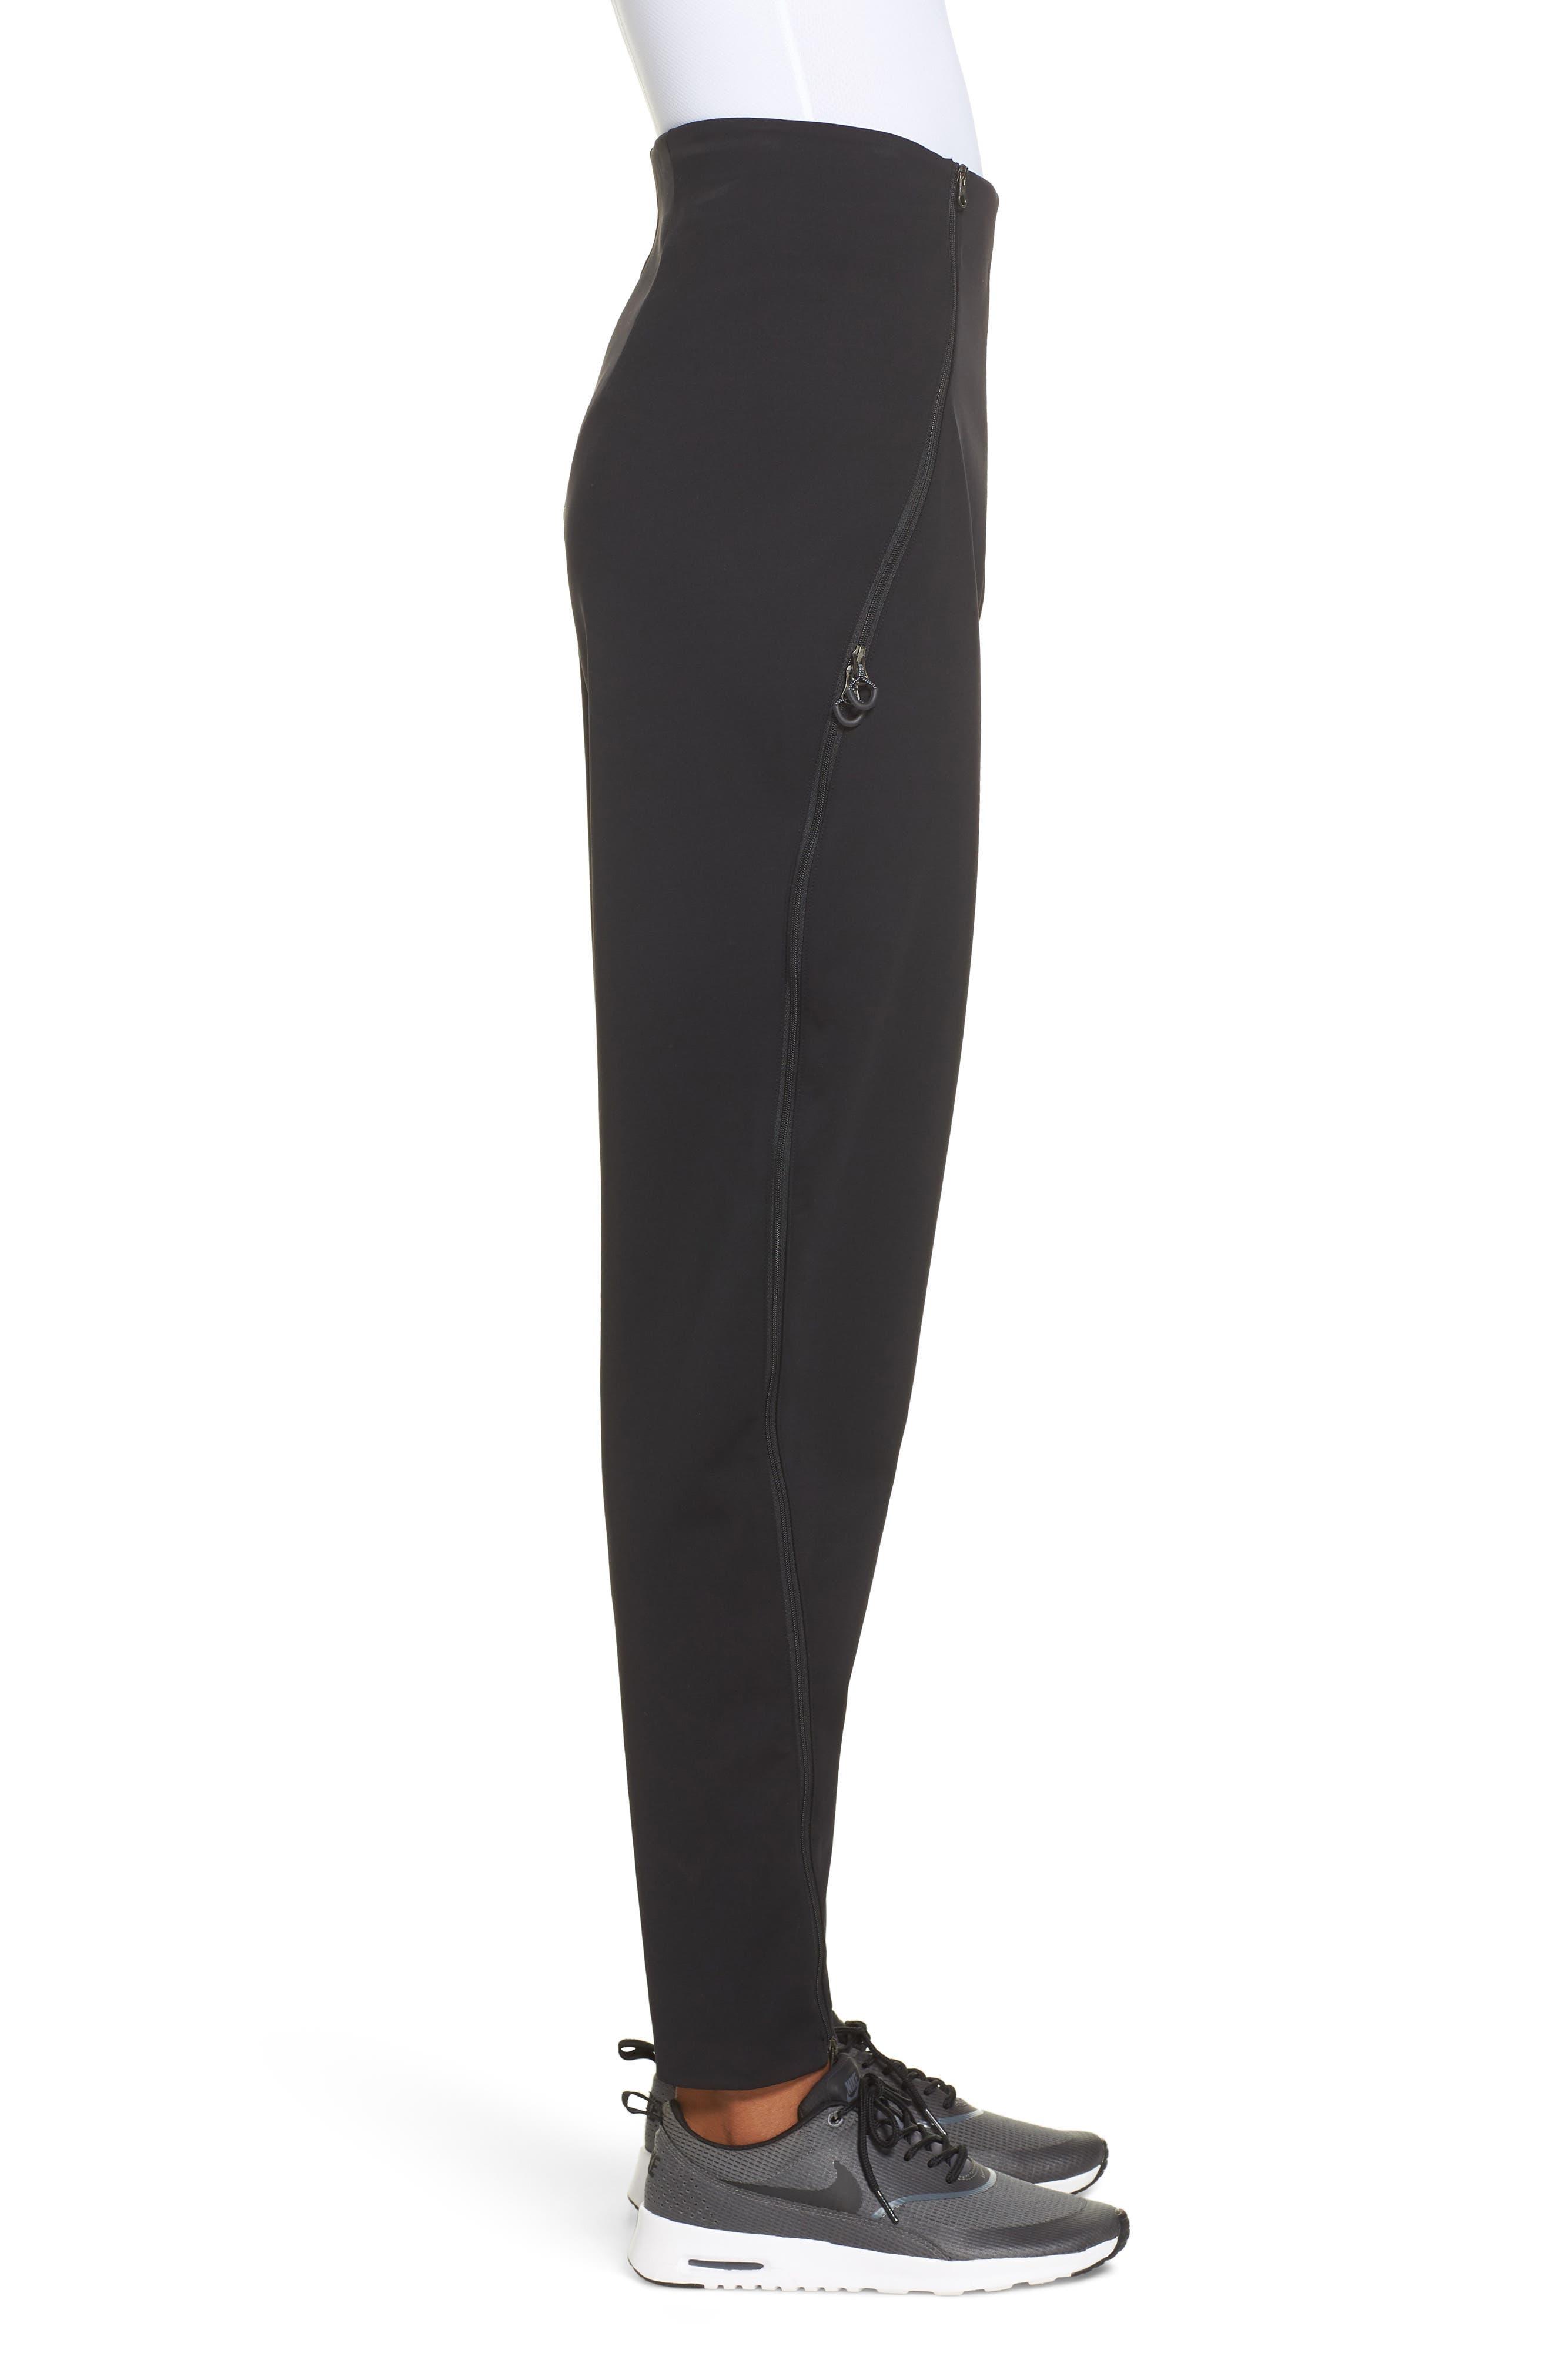 XX Project Women's Dri-FIT Training Pants,                             Alternate thumbnail 3, color,                             BLACK